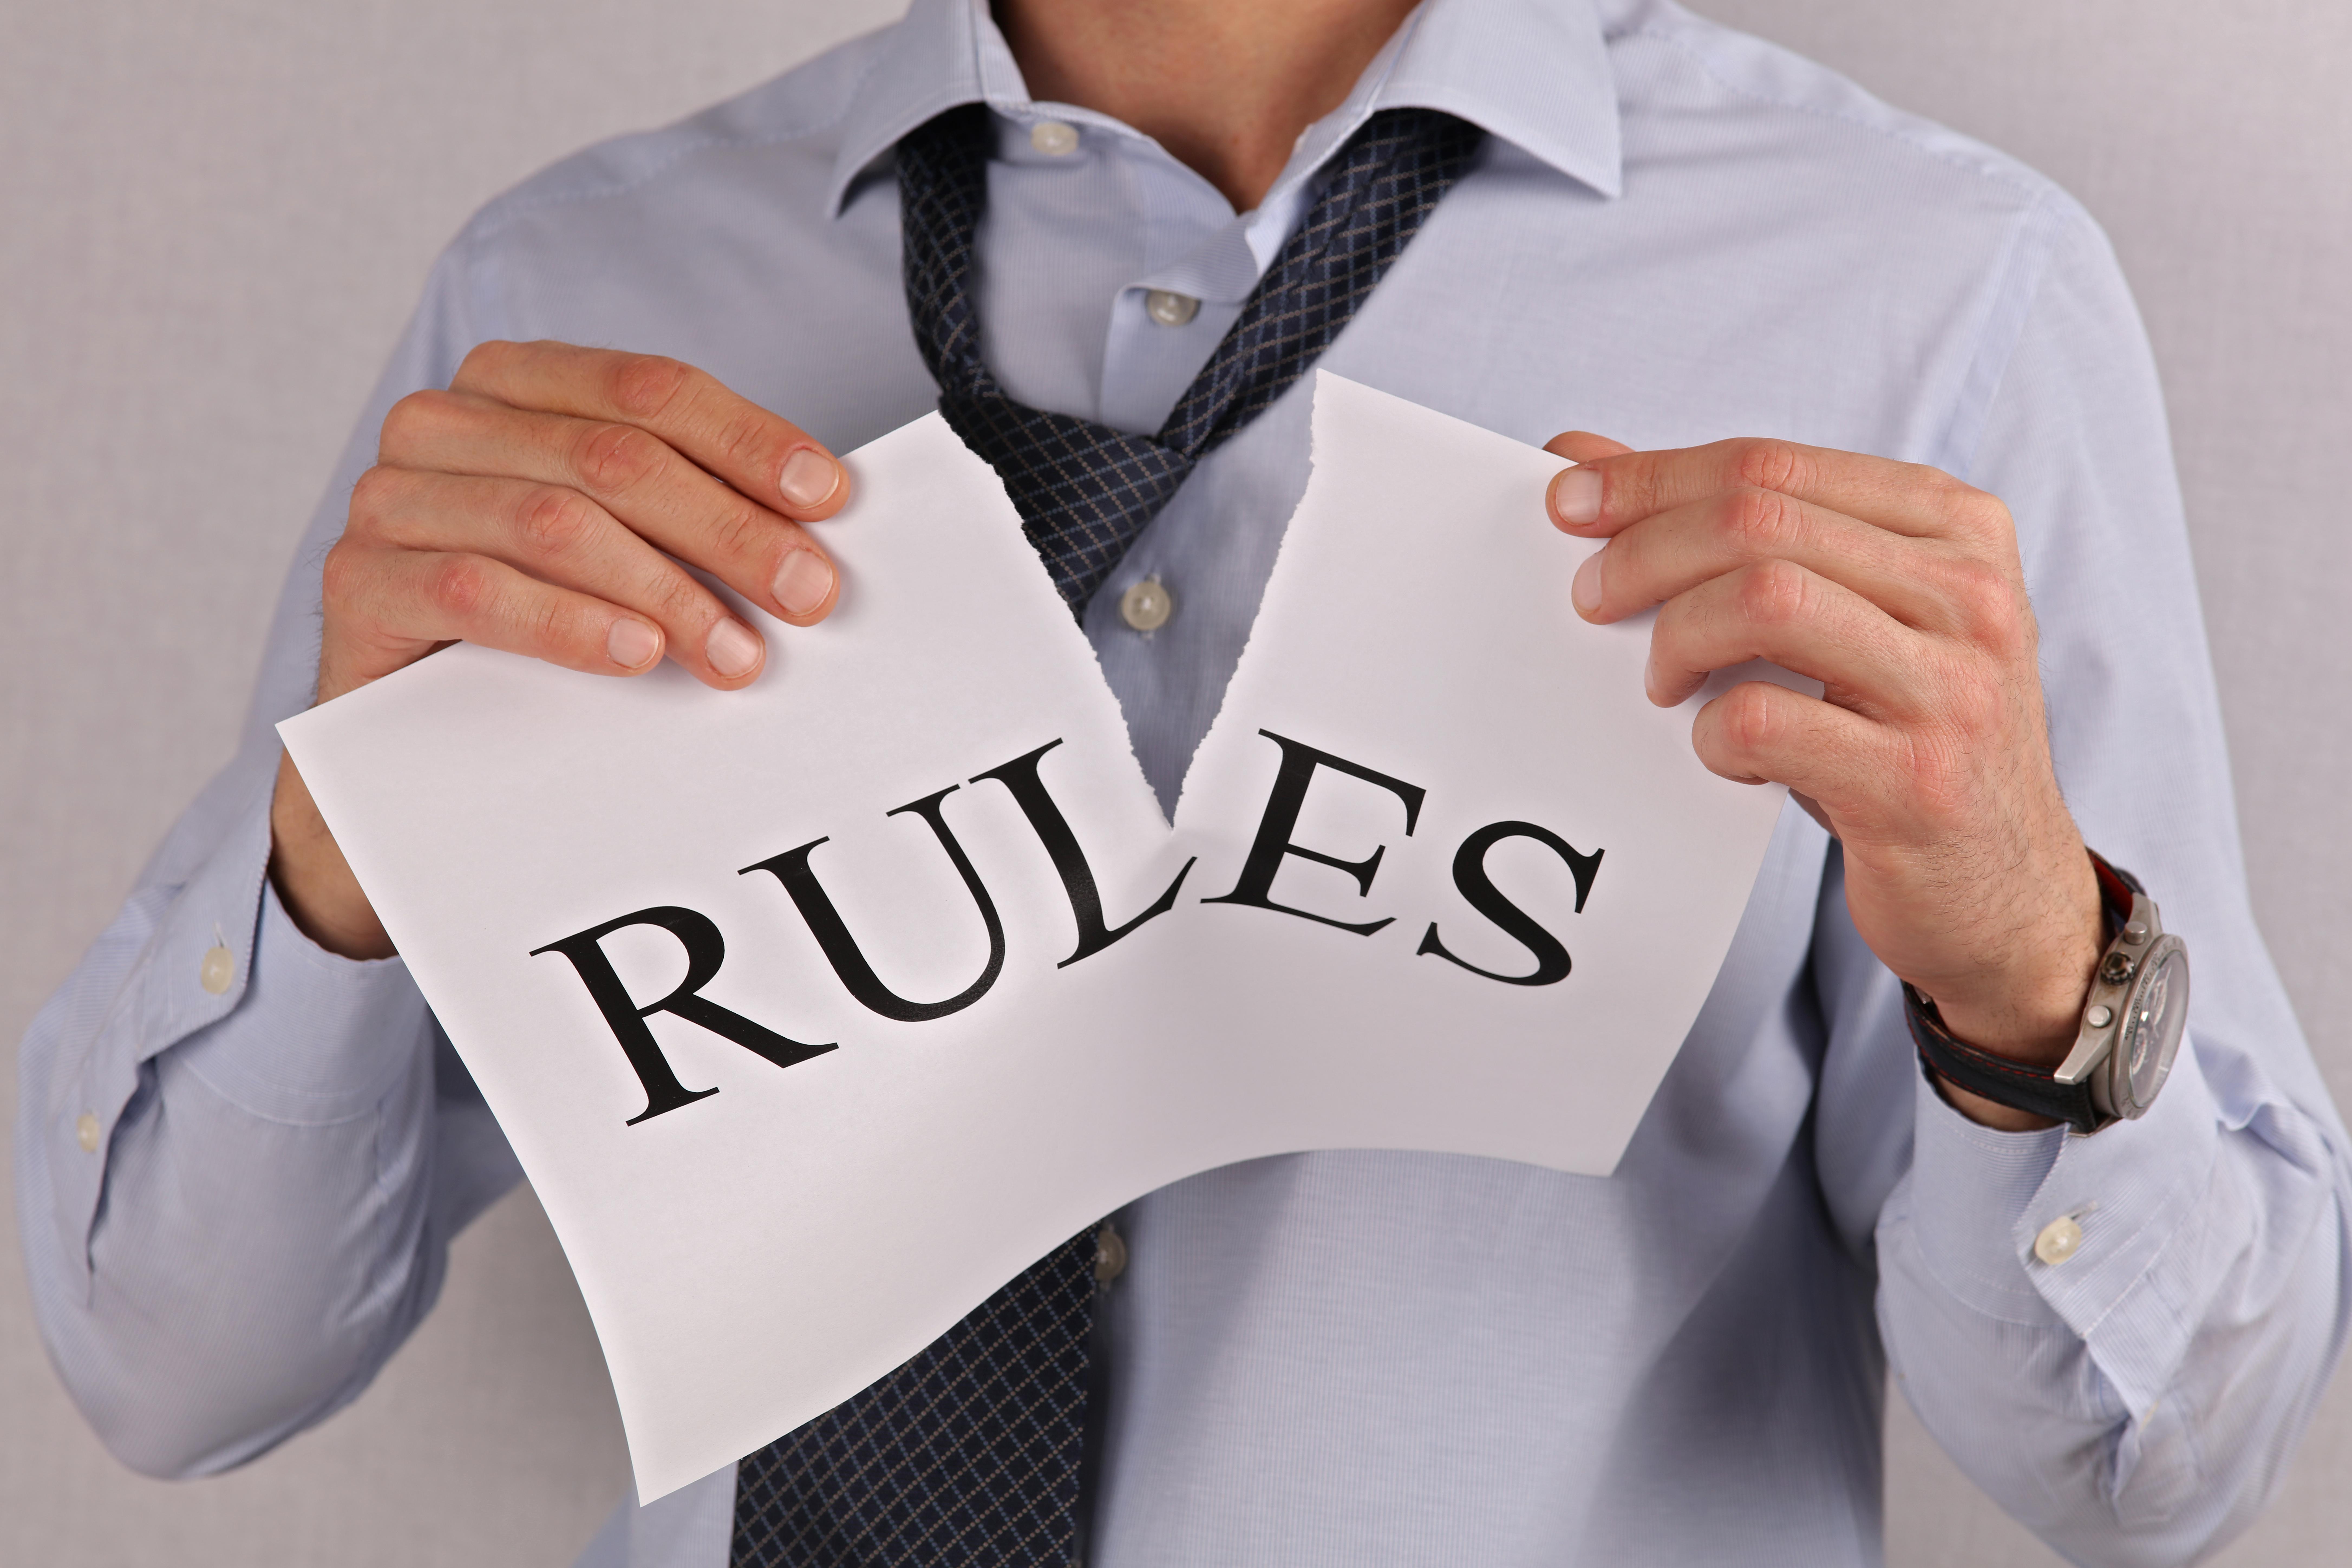 Are You a Rule Breaker? | CDR-U